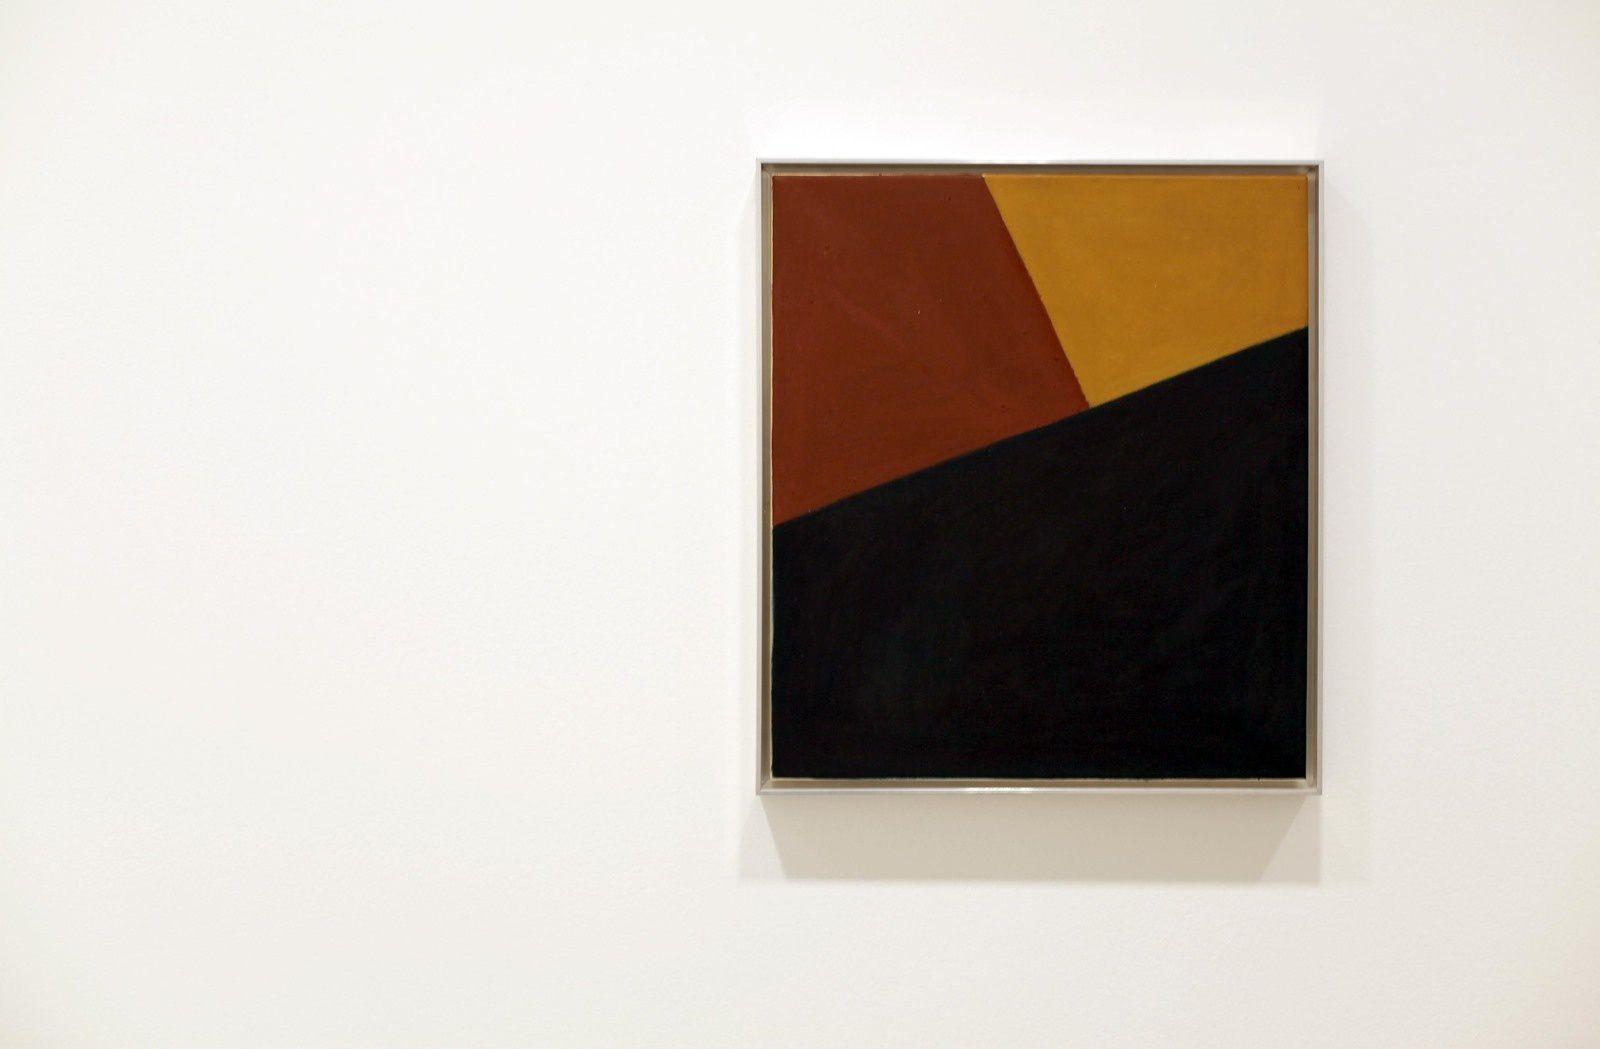 """Ohne Titel"", 1954 de Arnulf RAINER - Courtesy Galerie Thaddaeus Ropac © Photo Éric Simon"